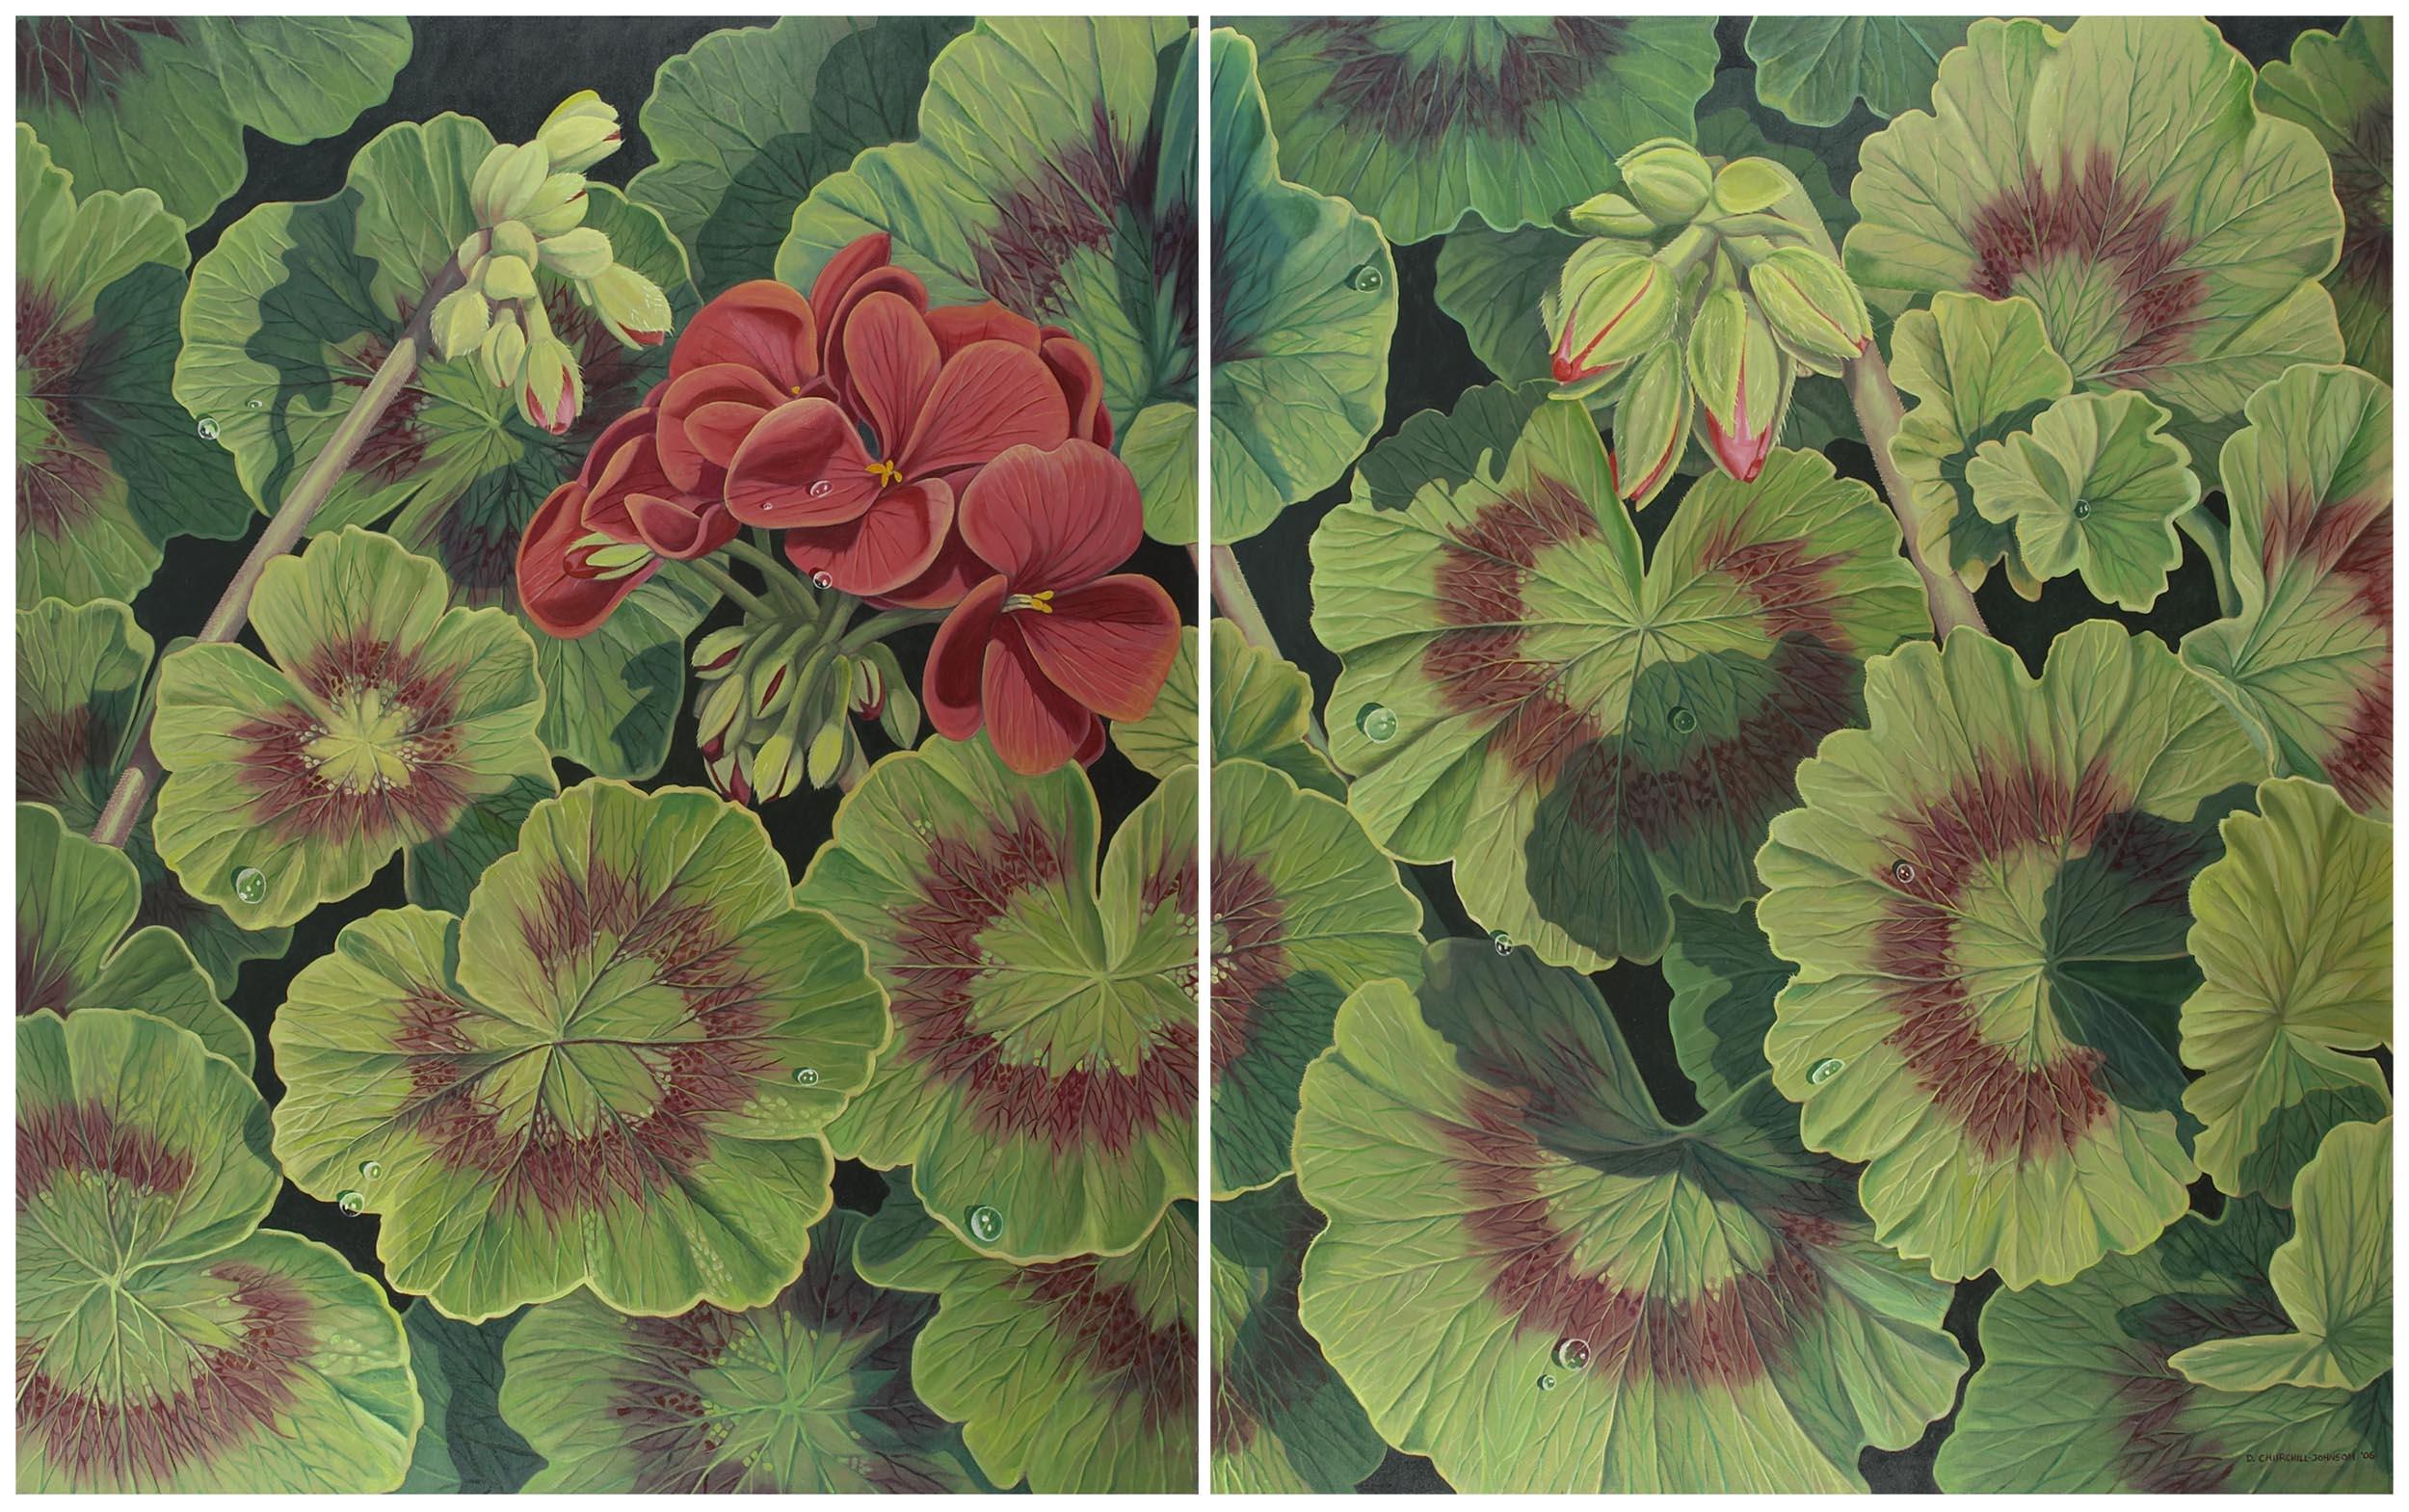 Geranium Diptych, 60 x 96 inches